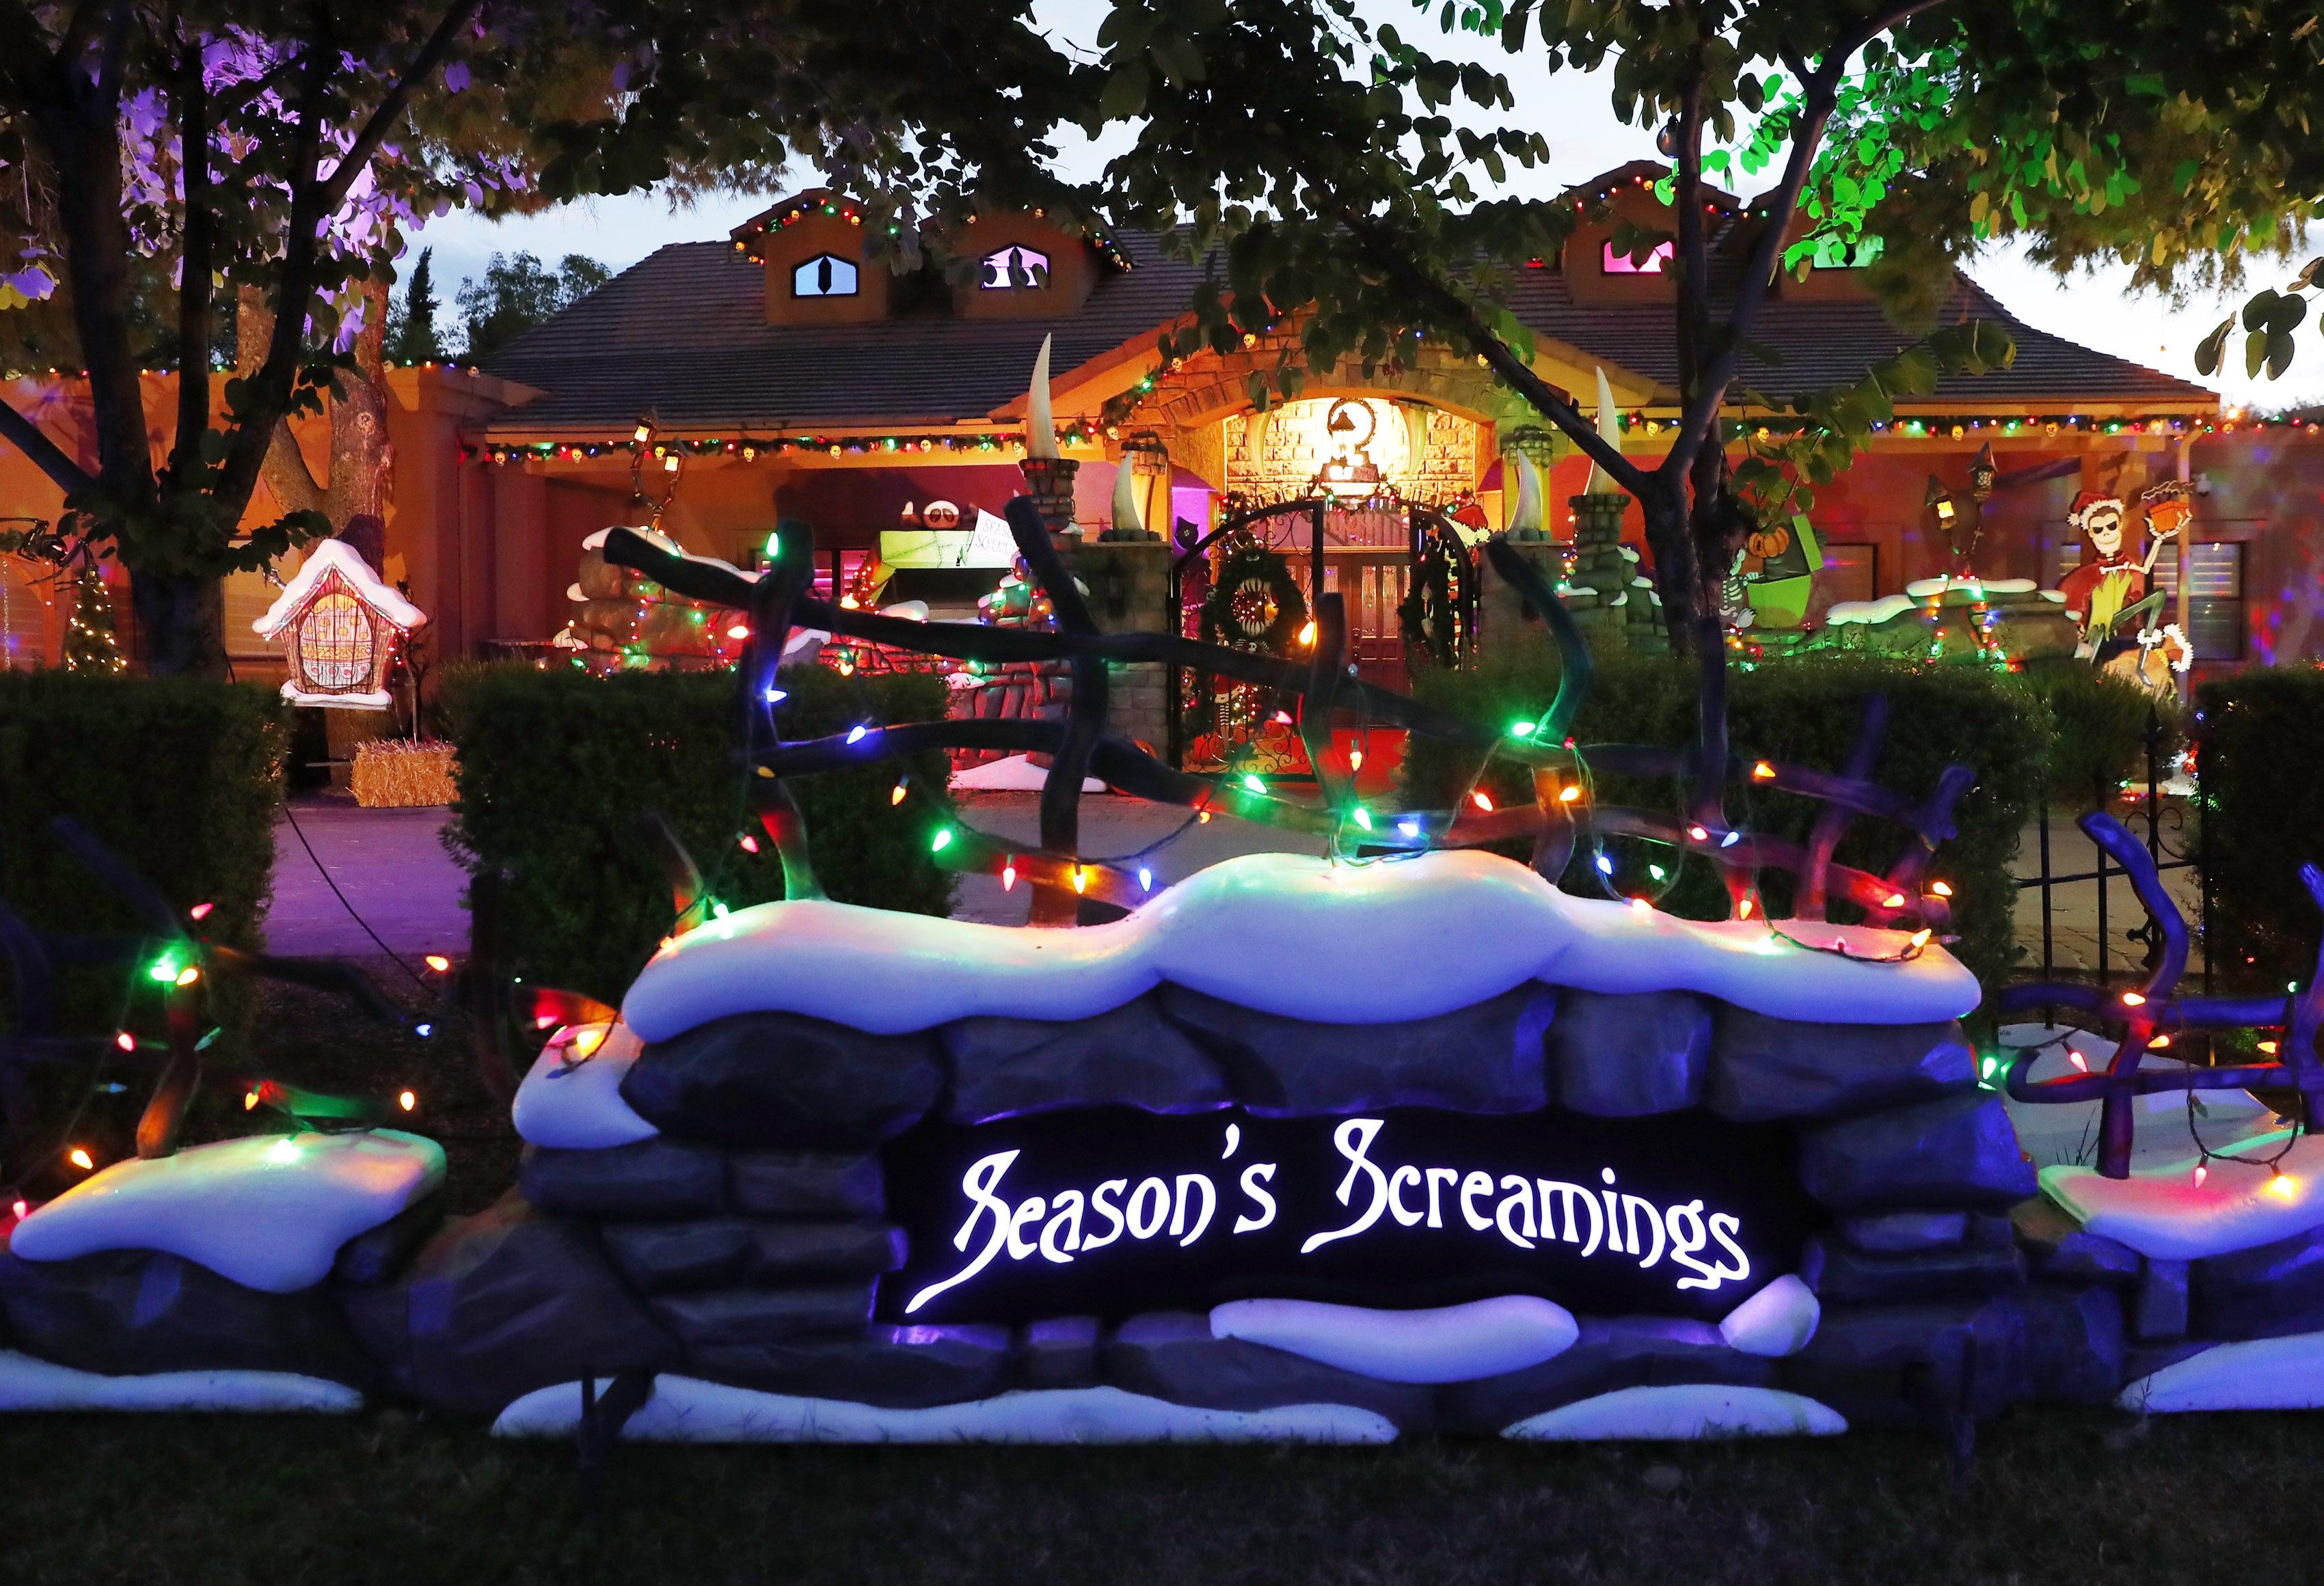 'Nightmare Before Christmas' inspires huge Halloween display at Tempe home